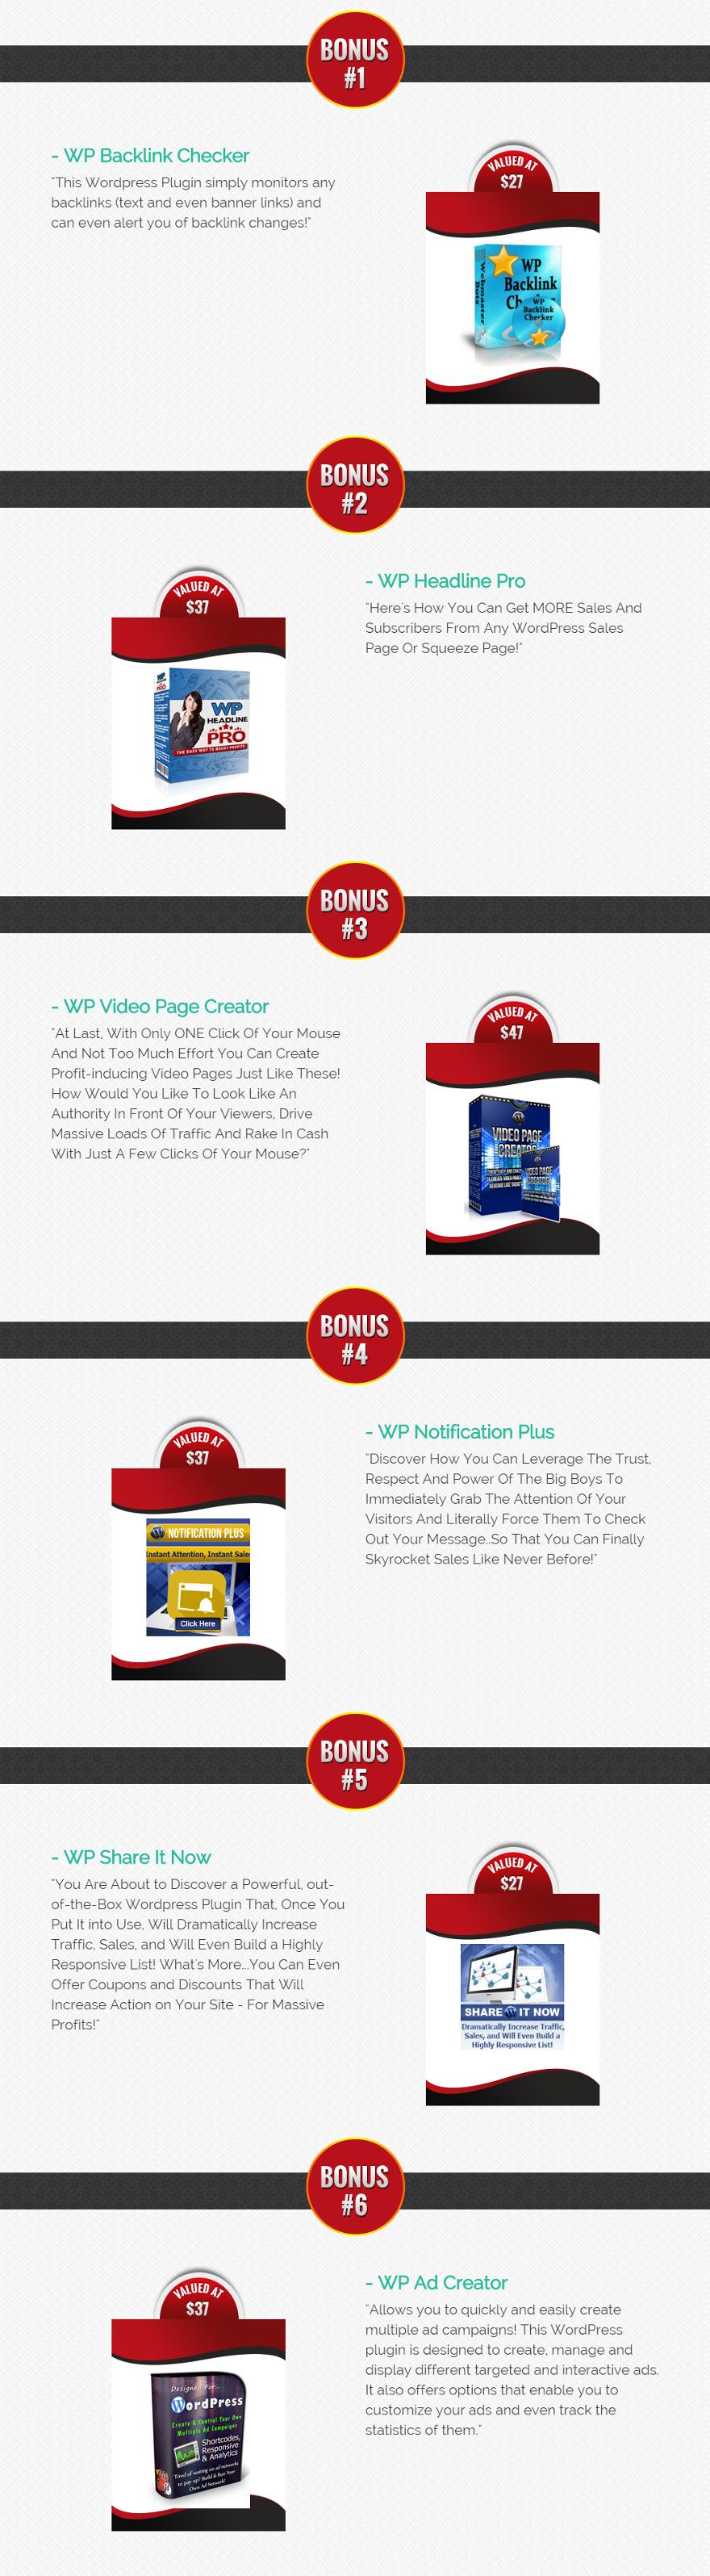 BlogIM Pro Bonuses